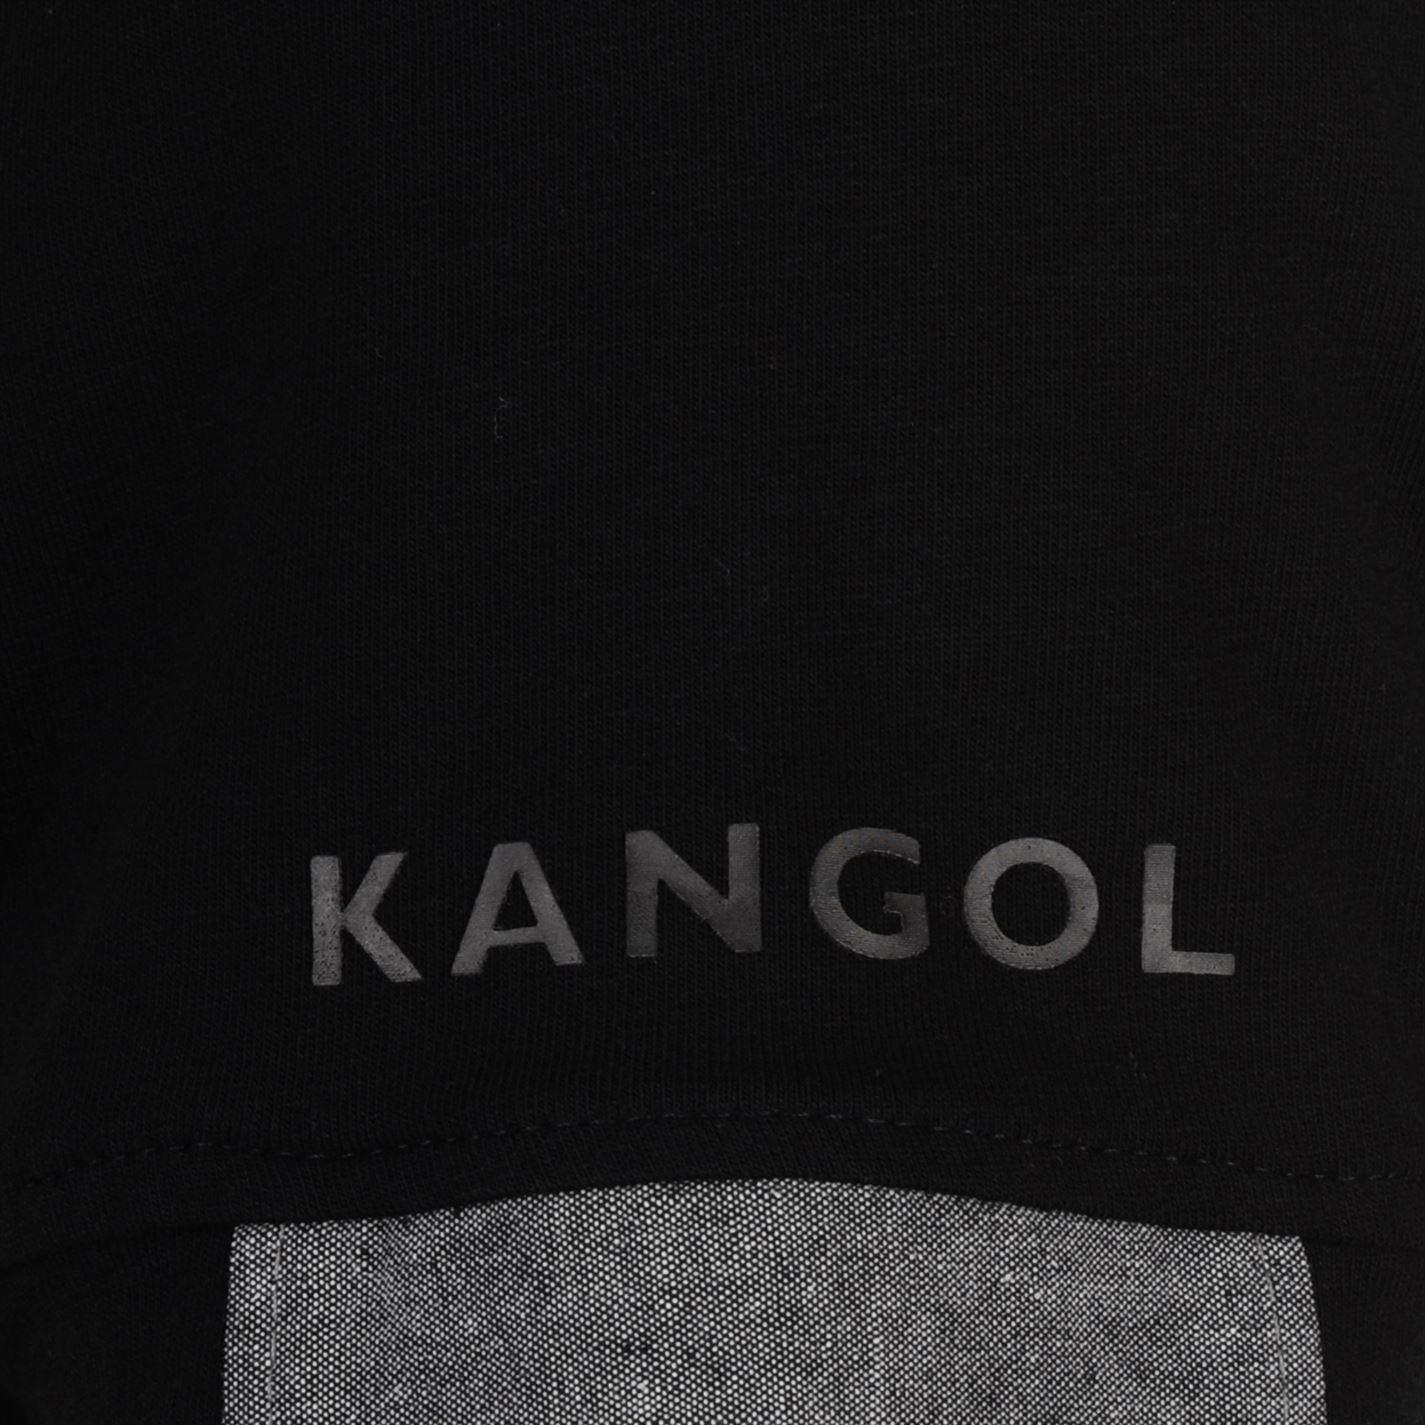 Kangol-Mens-Cham-Short-Sleeve-Polo-Shirt-Classic-Fit-Tee-Top-Lightweight-Colour thumbnail 7